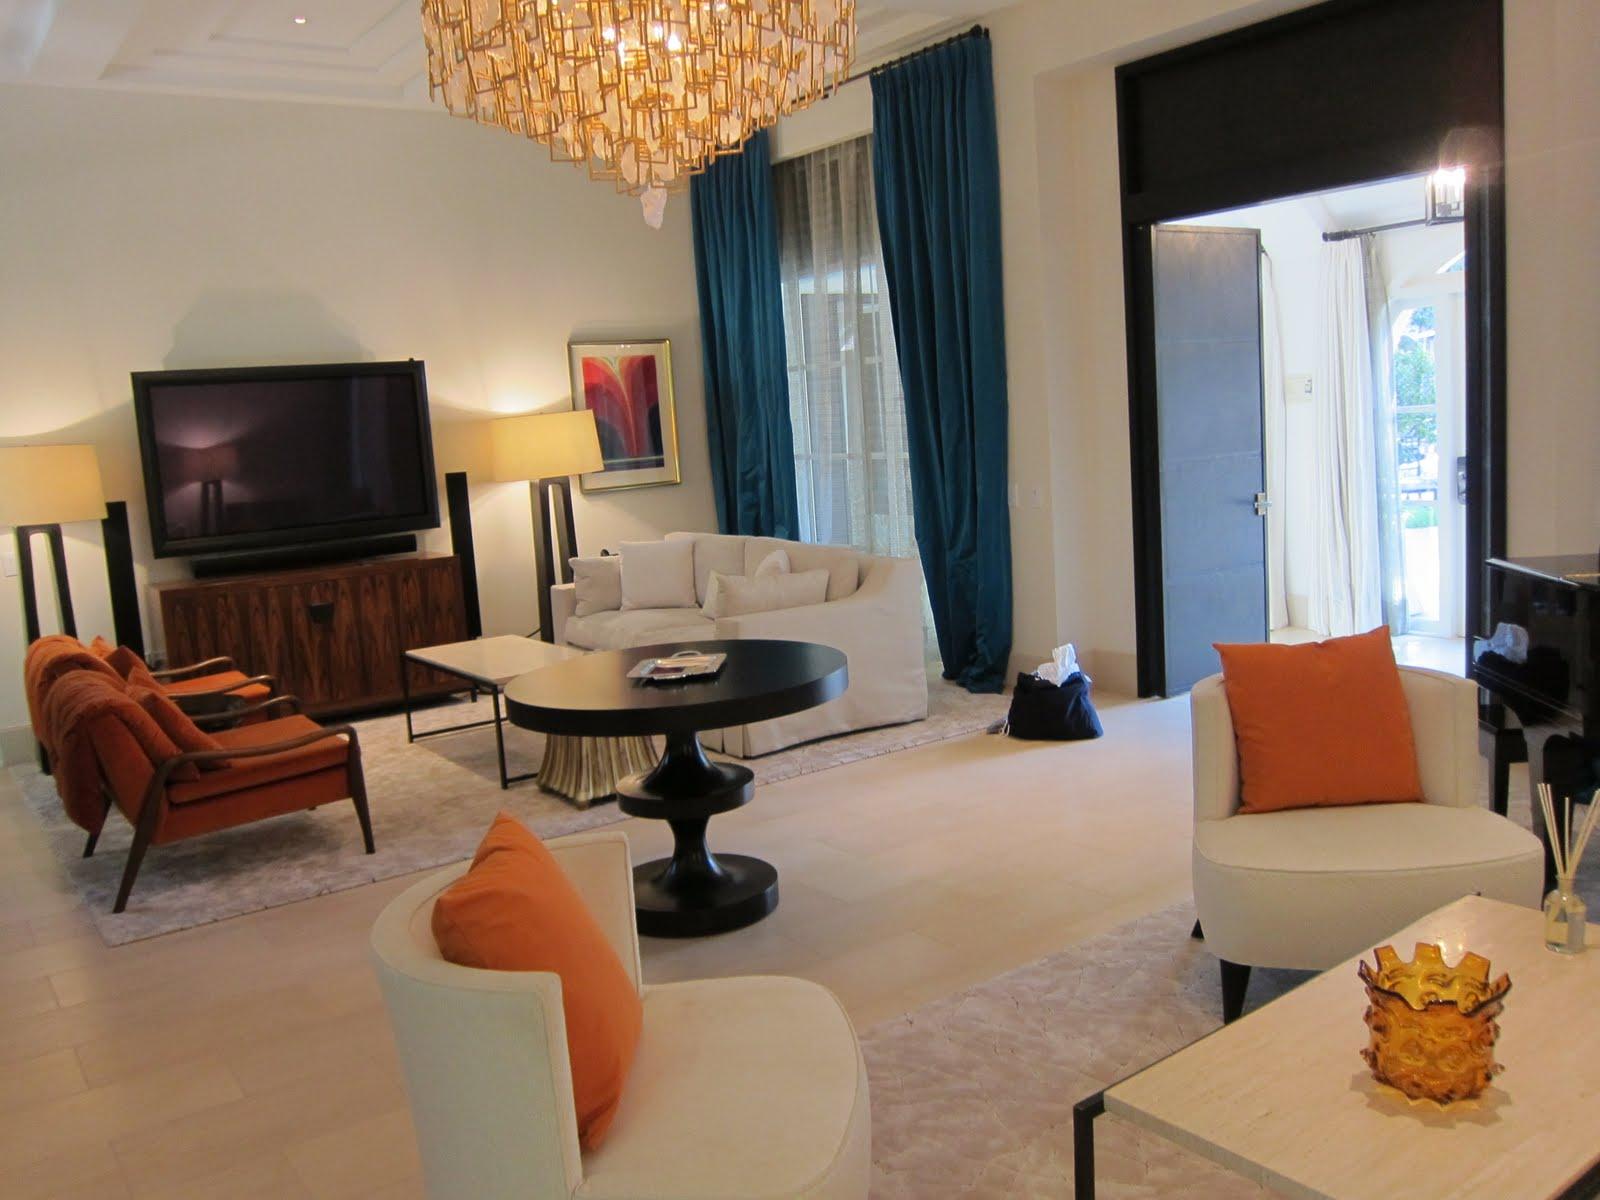 Julie Pryor s Blog The Presidential Suite at Hotel Bel Air